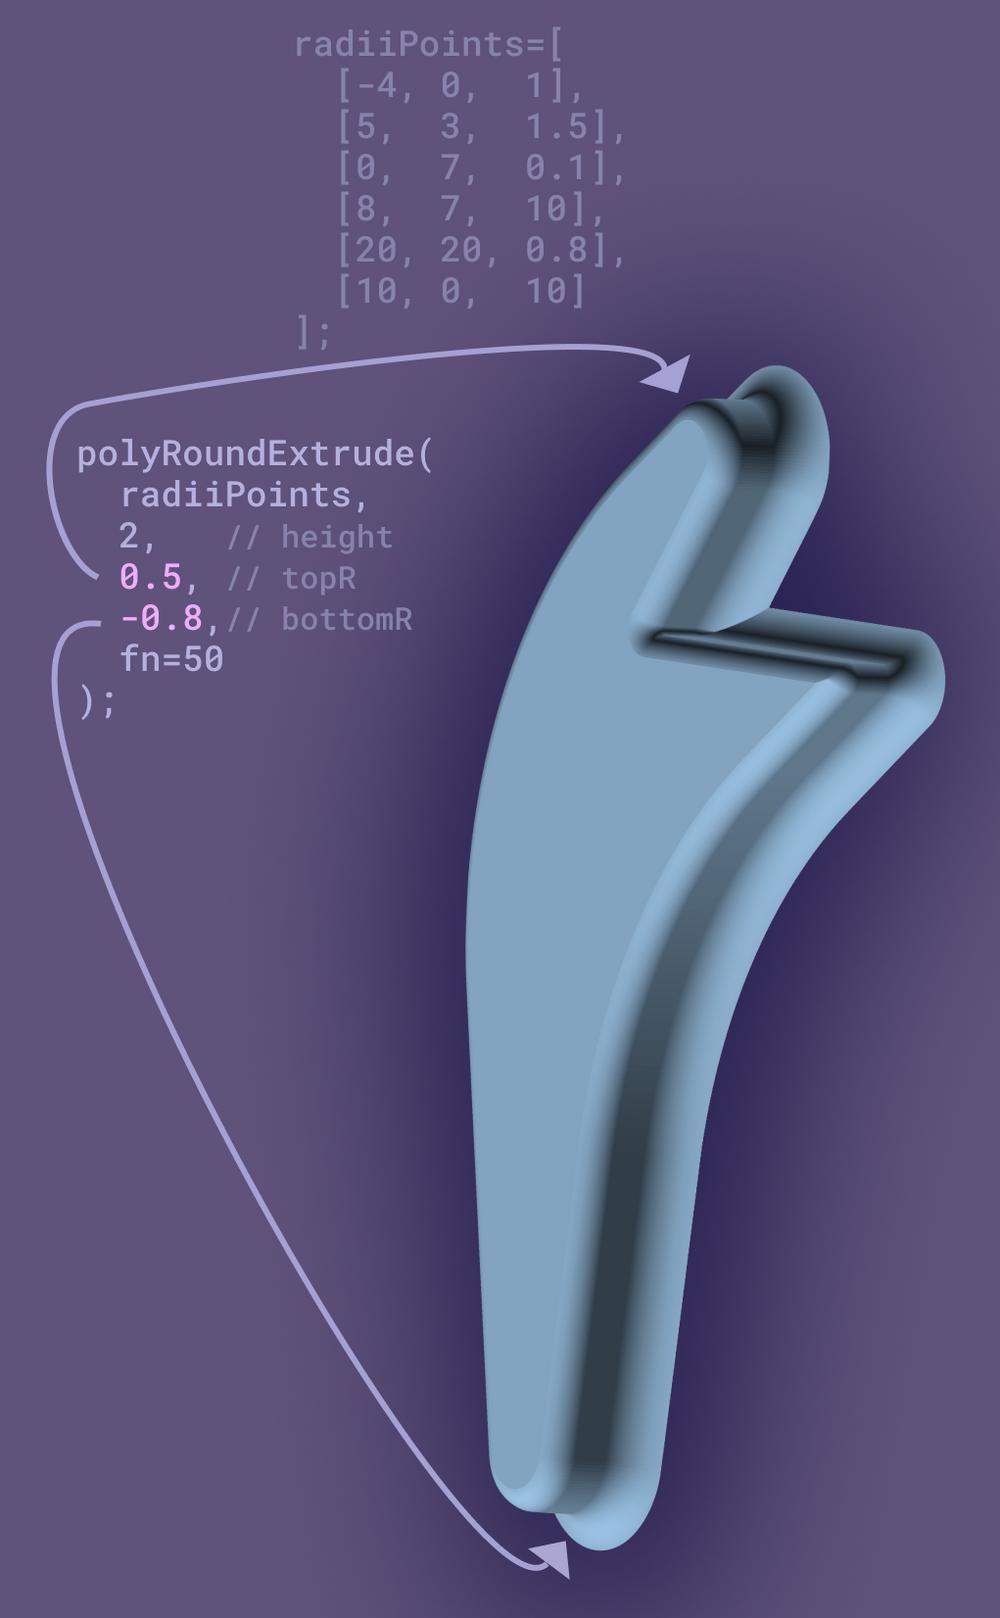 polyRoundExtrude api example.